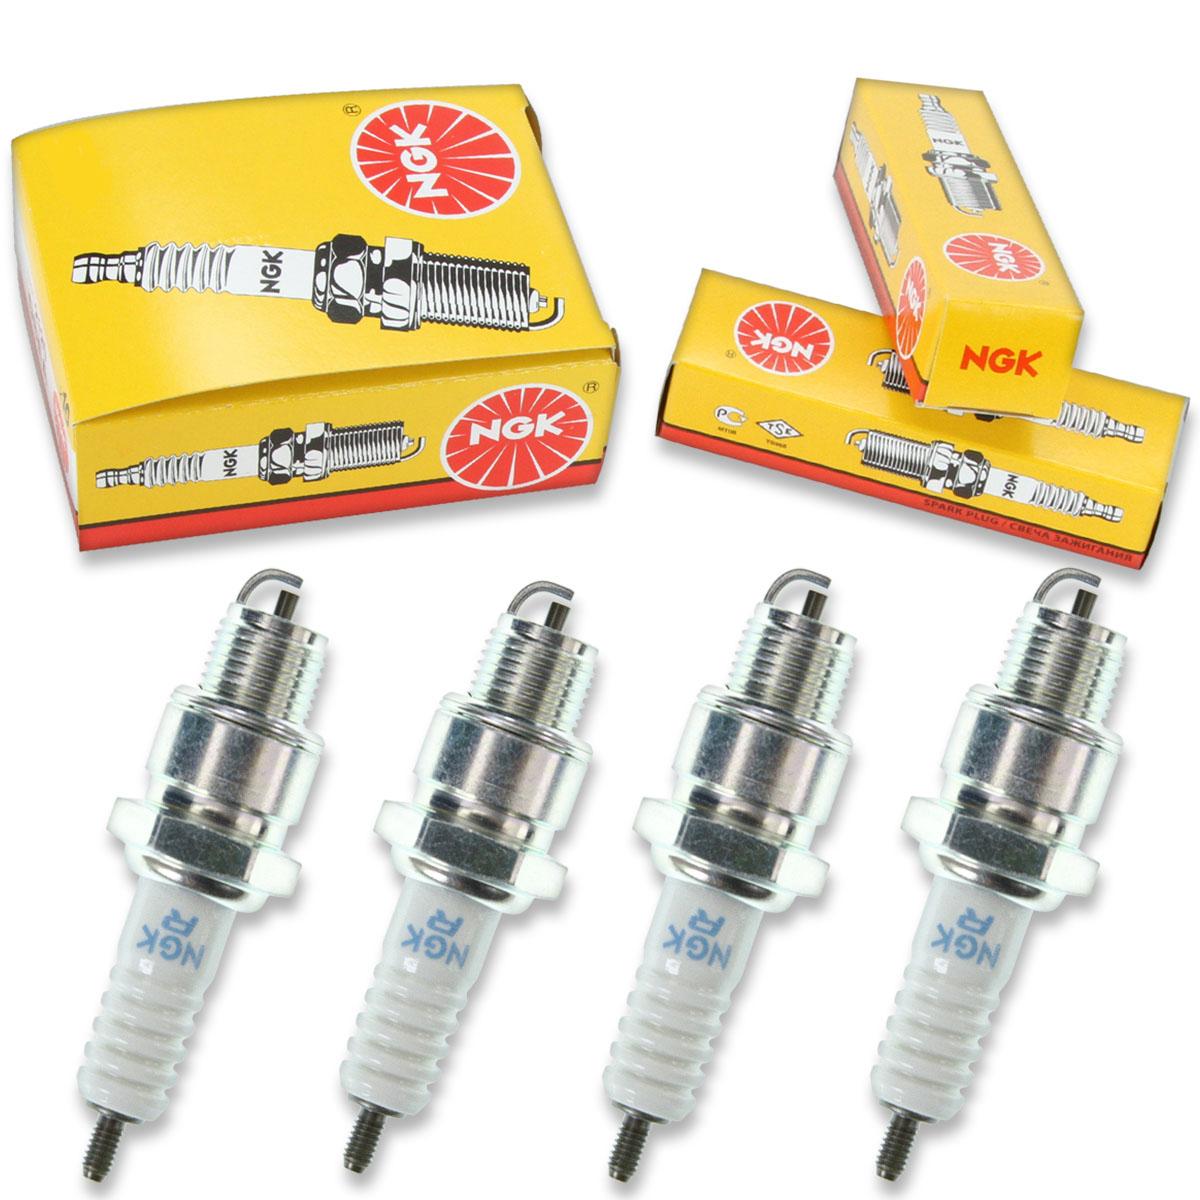 [WLLP_2054]   4pcs 2011 KYMCO Mongoose 50 NGK Standard Spark Plugs 49cc 2ci Kit Set Engine  ch | eBay | Kymco And Spark Plug Wiring Harness |  | eBay